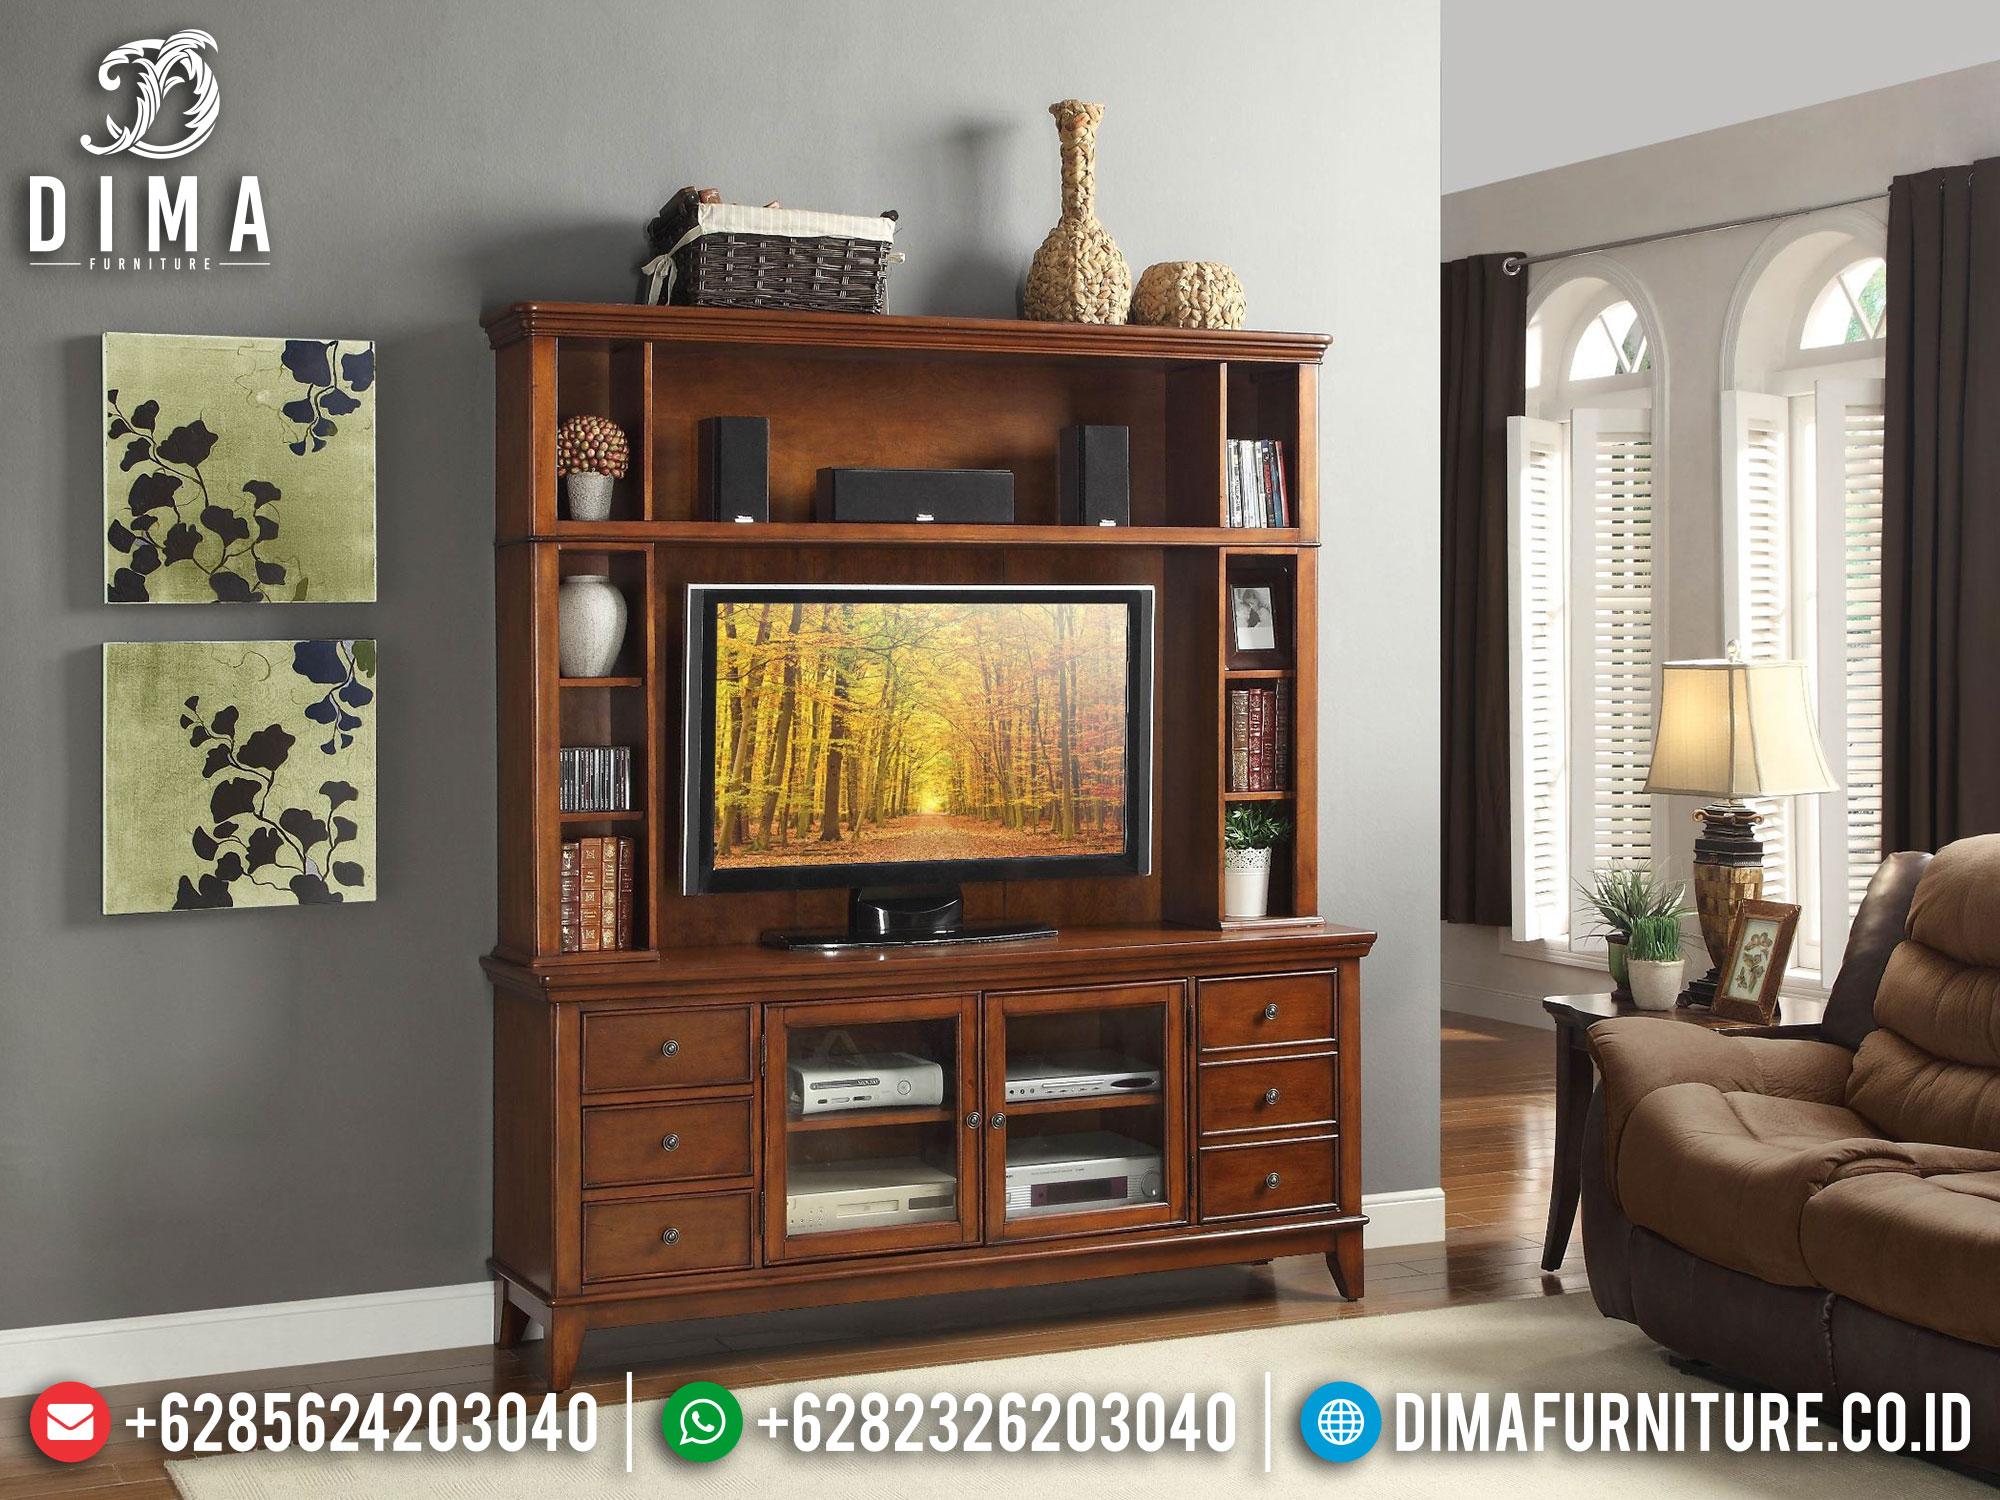 Lemari Hias Jati Natural Set Bufet TV Minimalis Classic Best Seller TTJ-1678